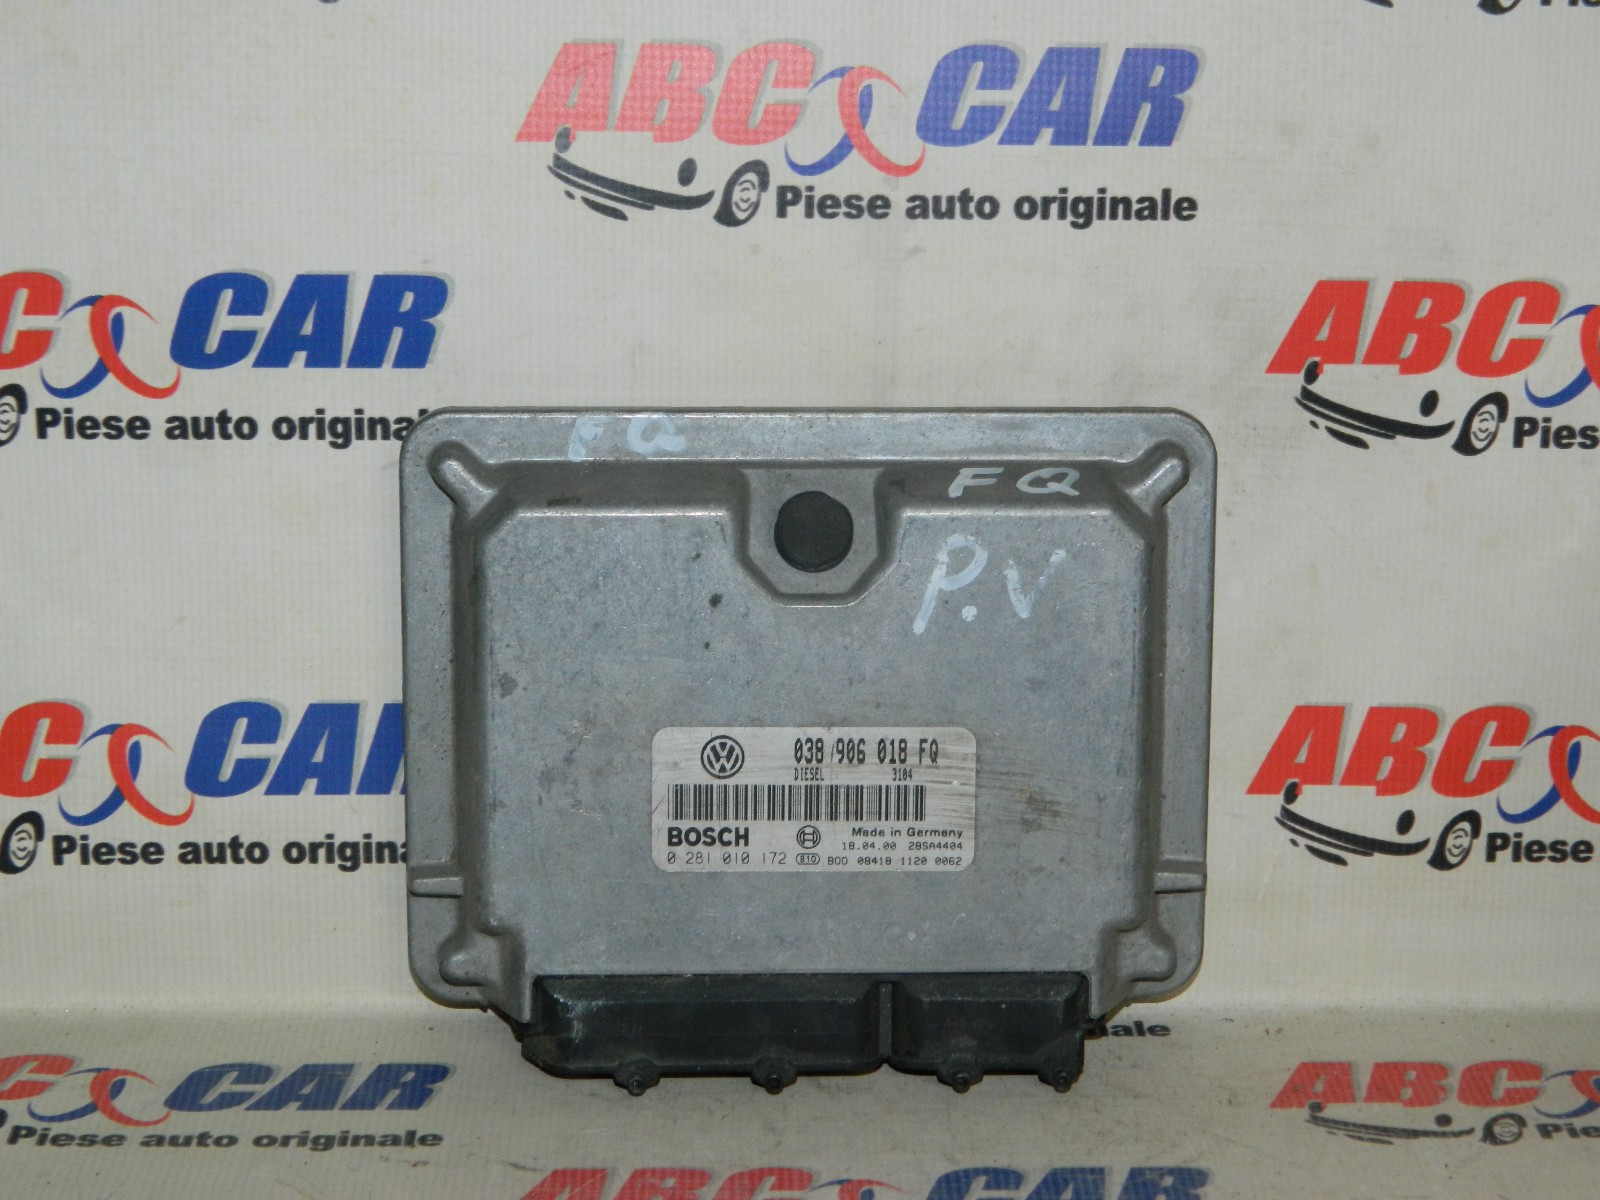 Calculator Motor Vw Passat B5 1 9 Tdi Ahu 90cp 038906018fq Piese